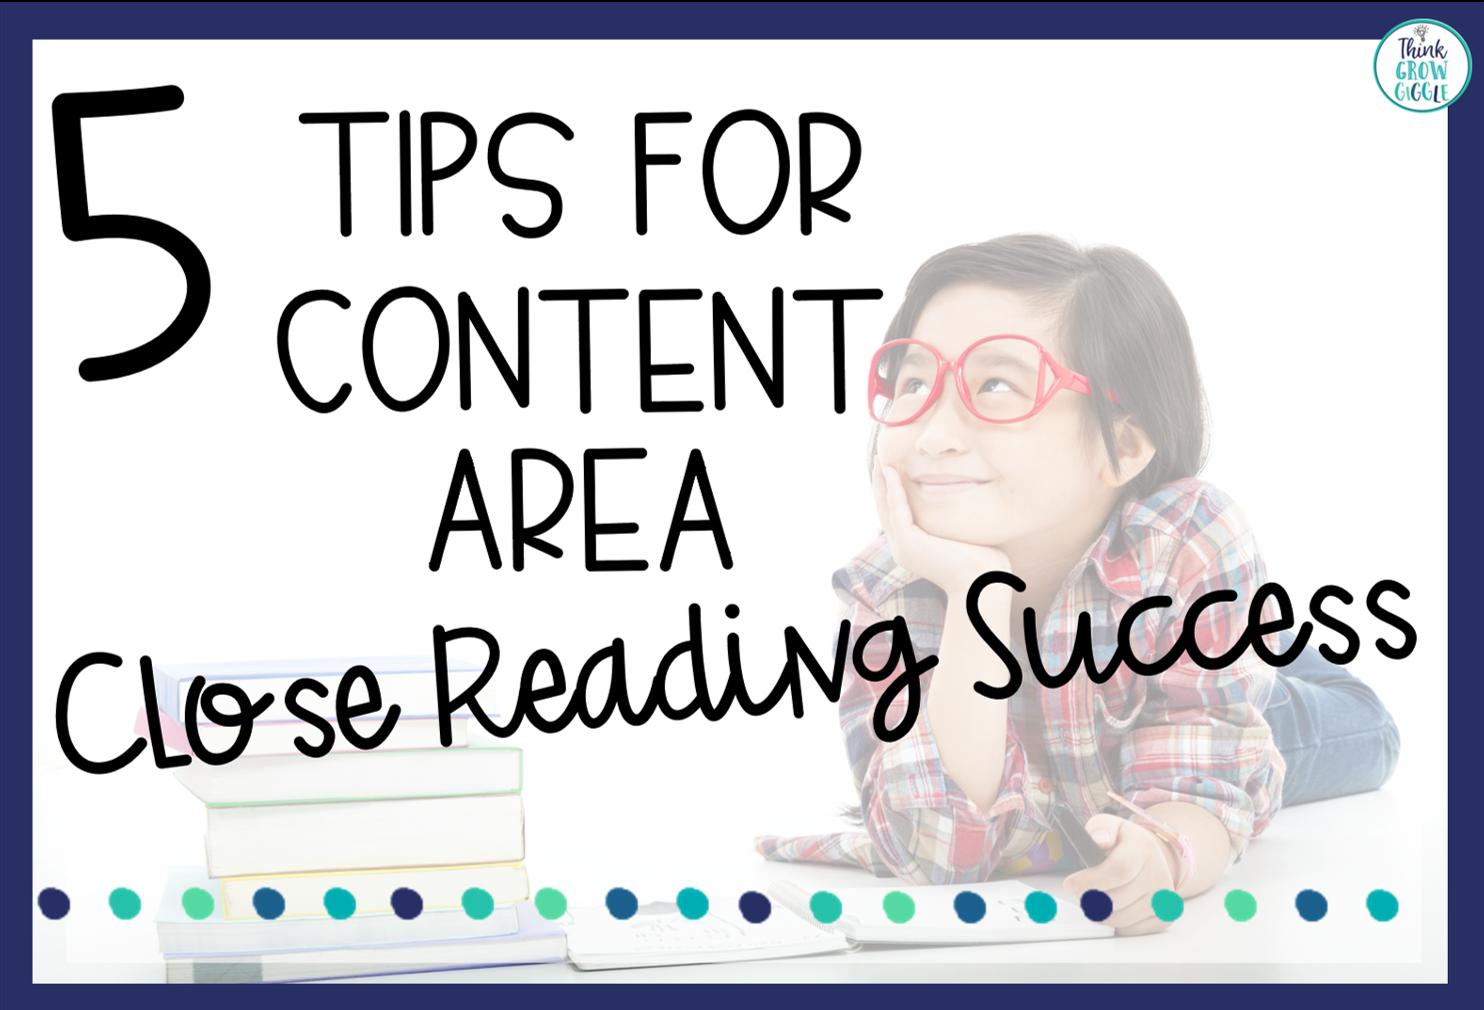 Worksheet Close Reading Images Close Reading Images